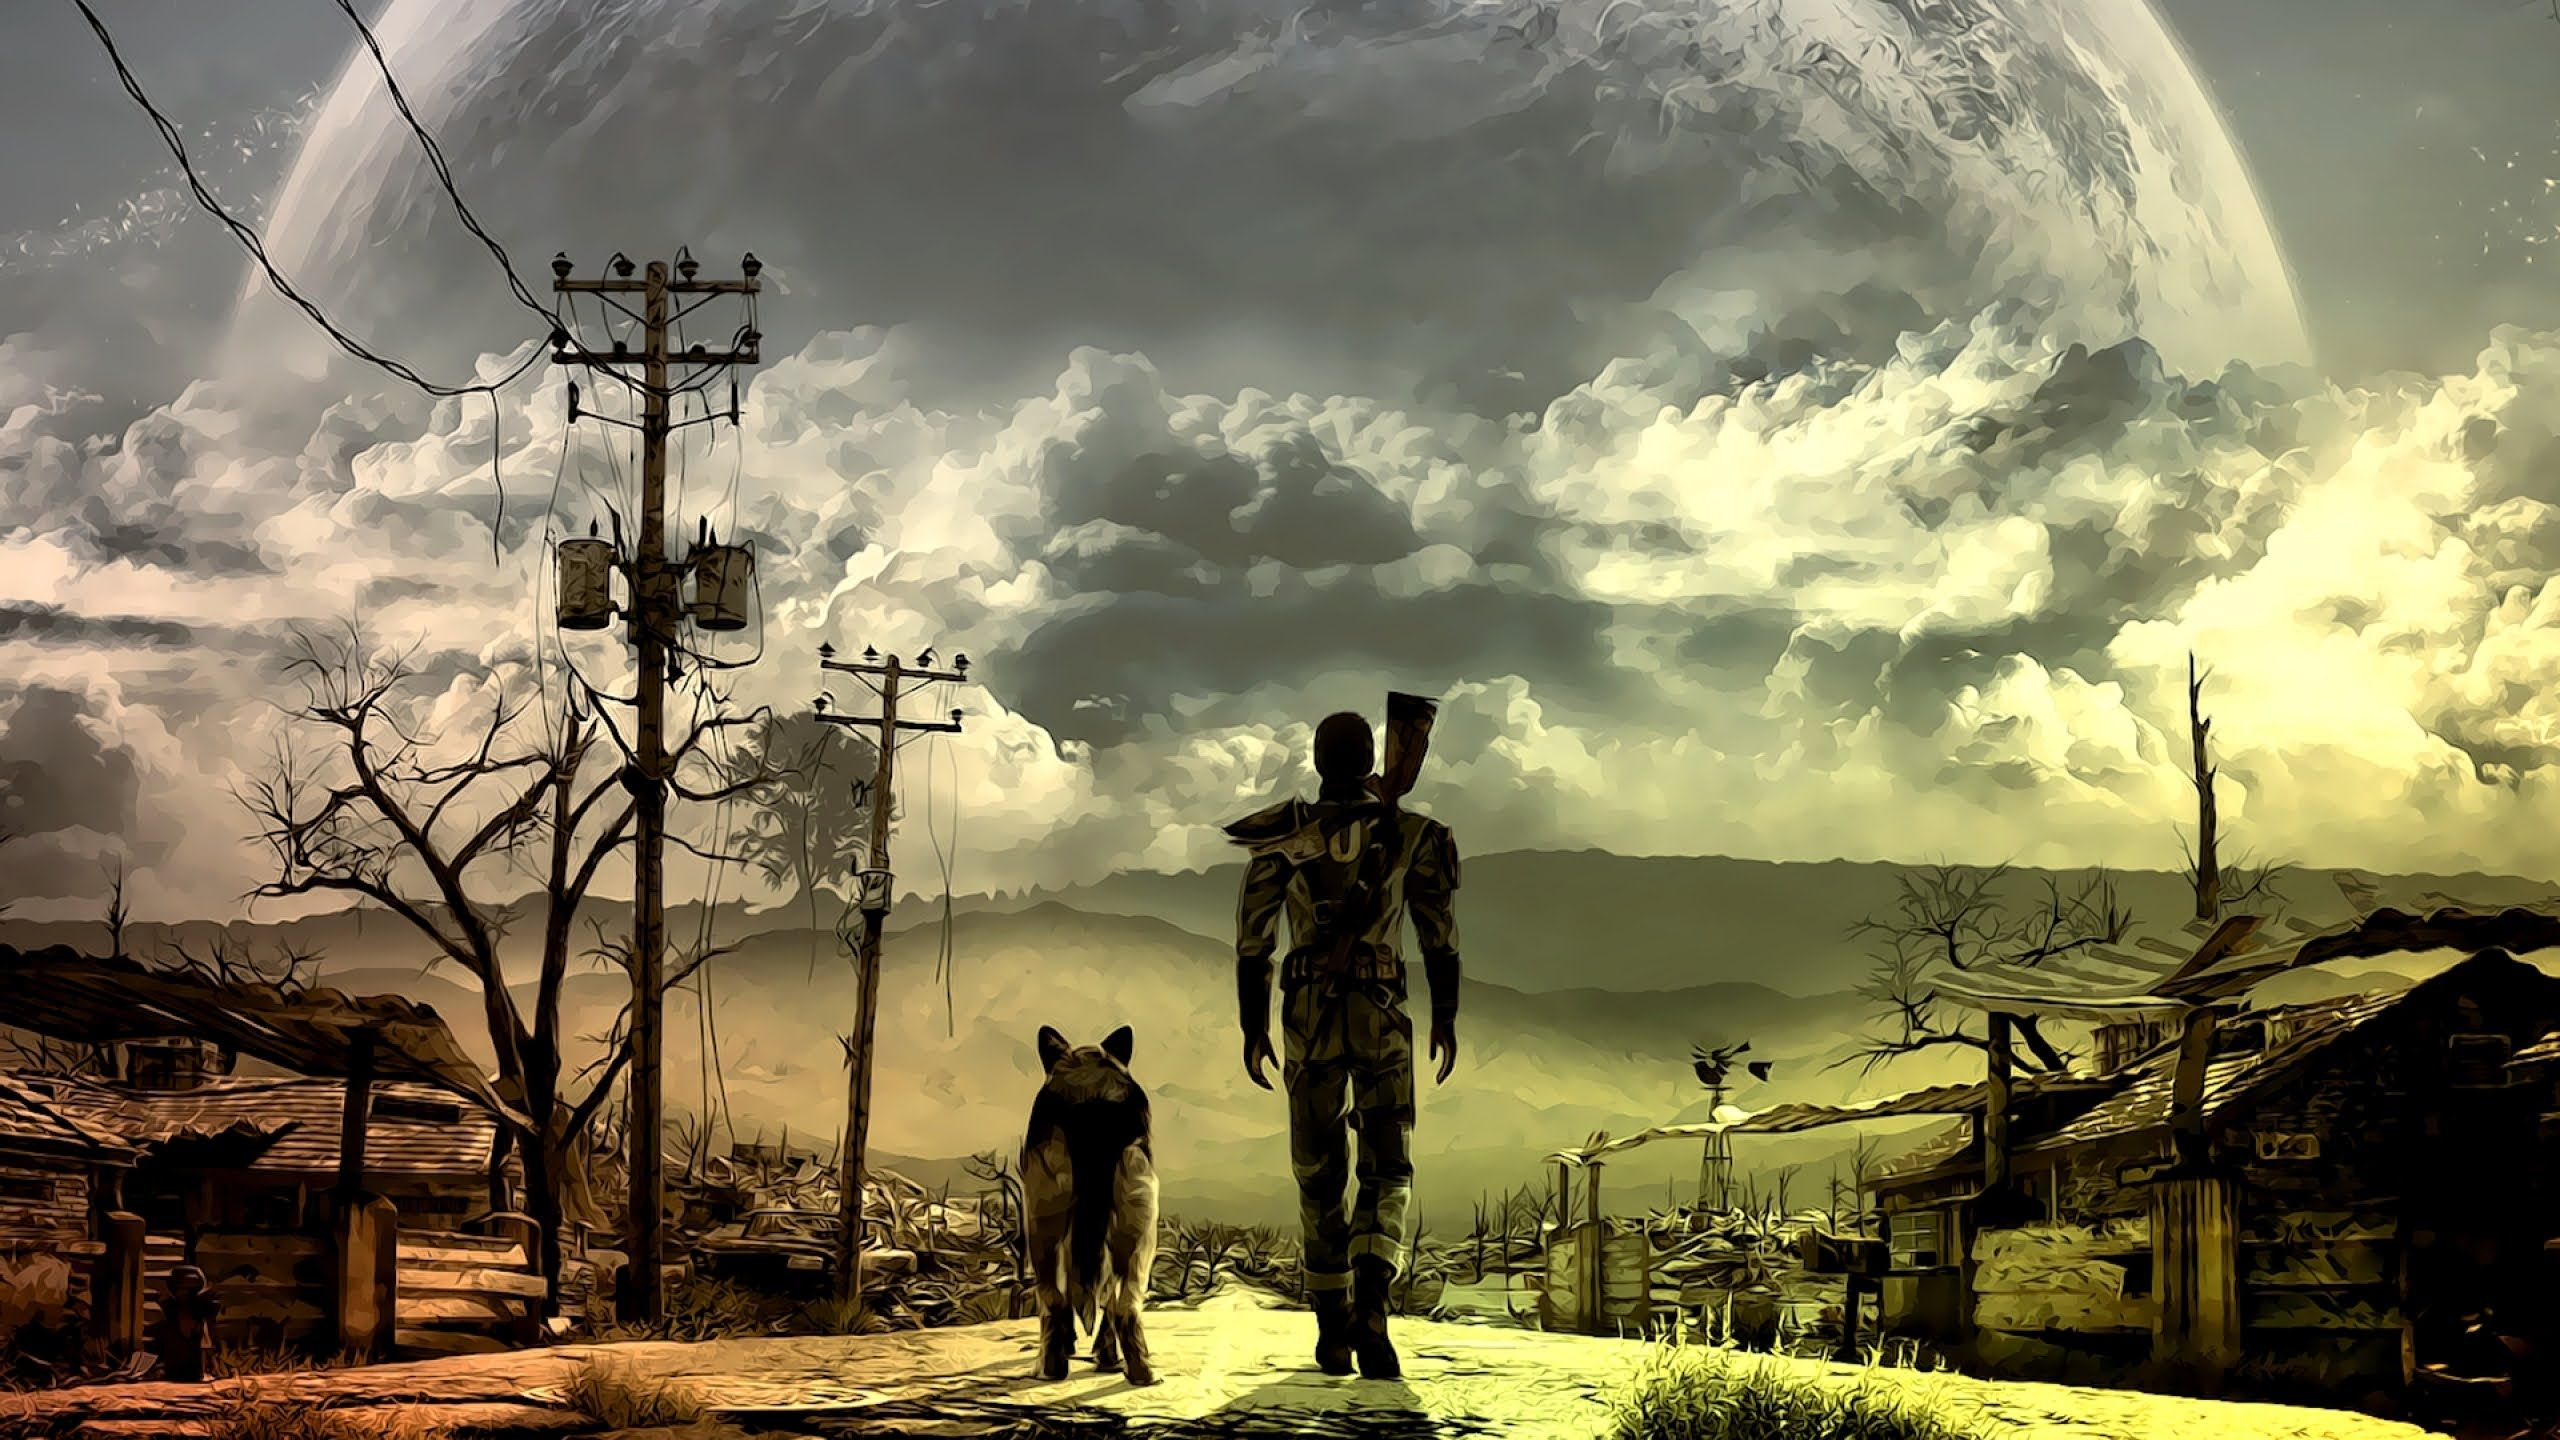 Killzone Shadow Fall Ps4 Wallpaper Fallout 4 Ps4 Wallpapers Ps4 Home